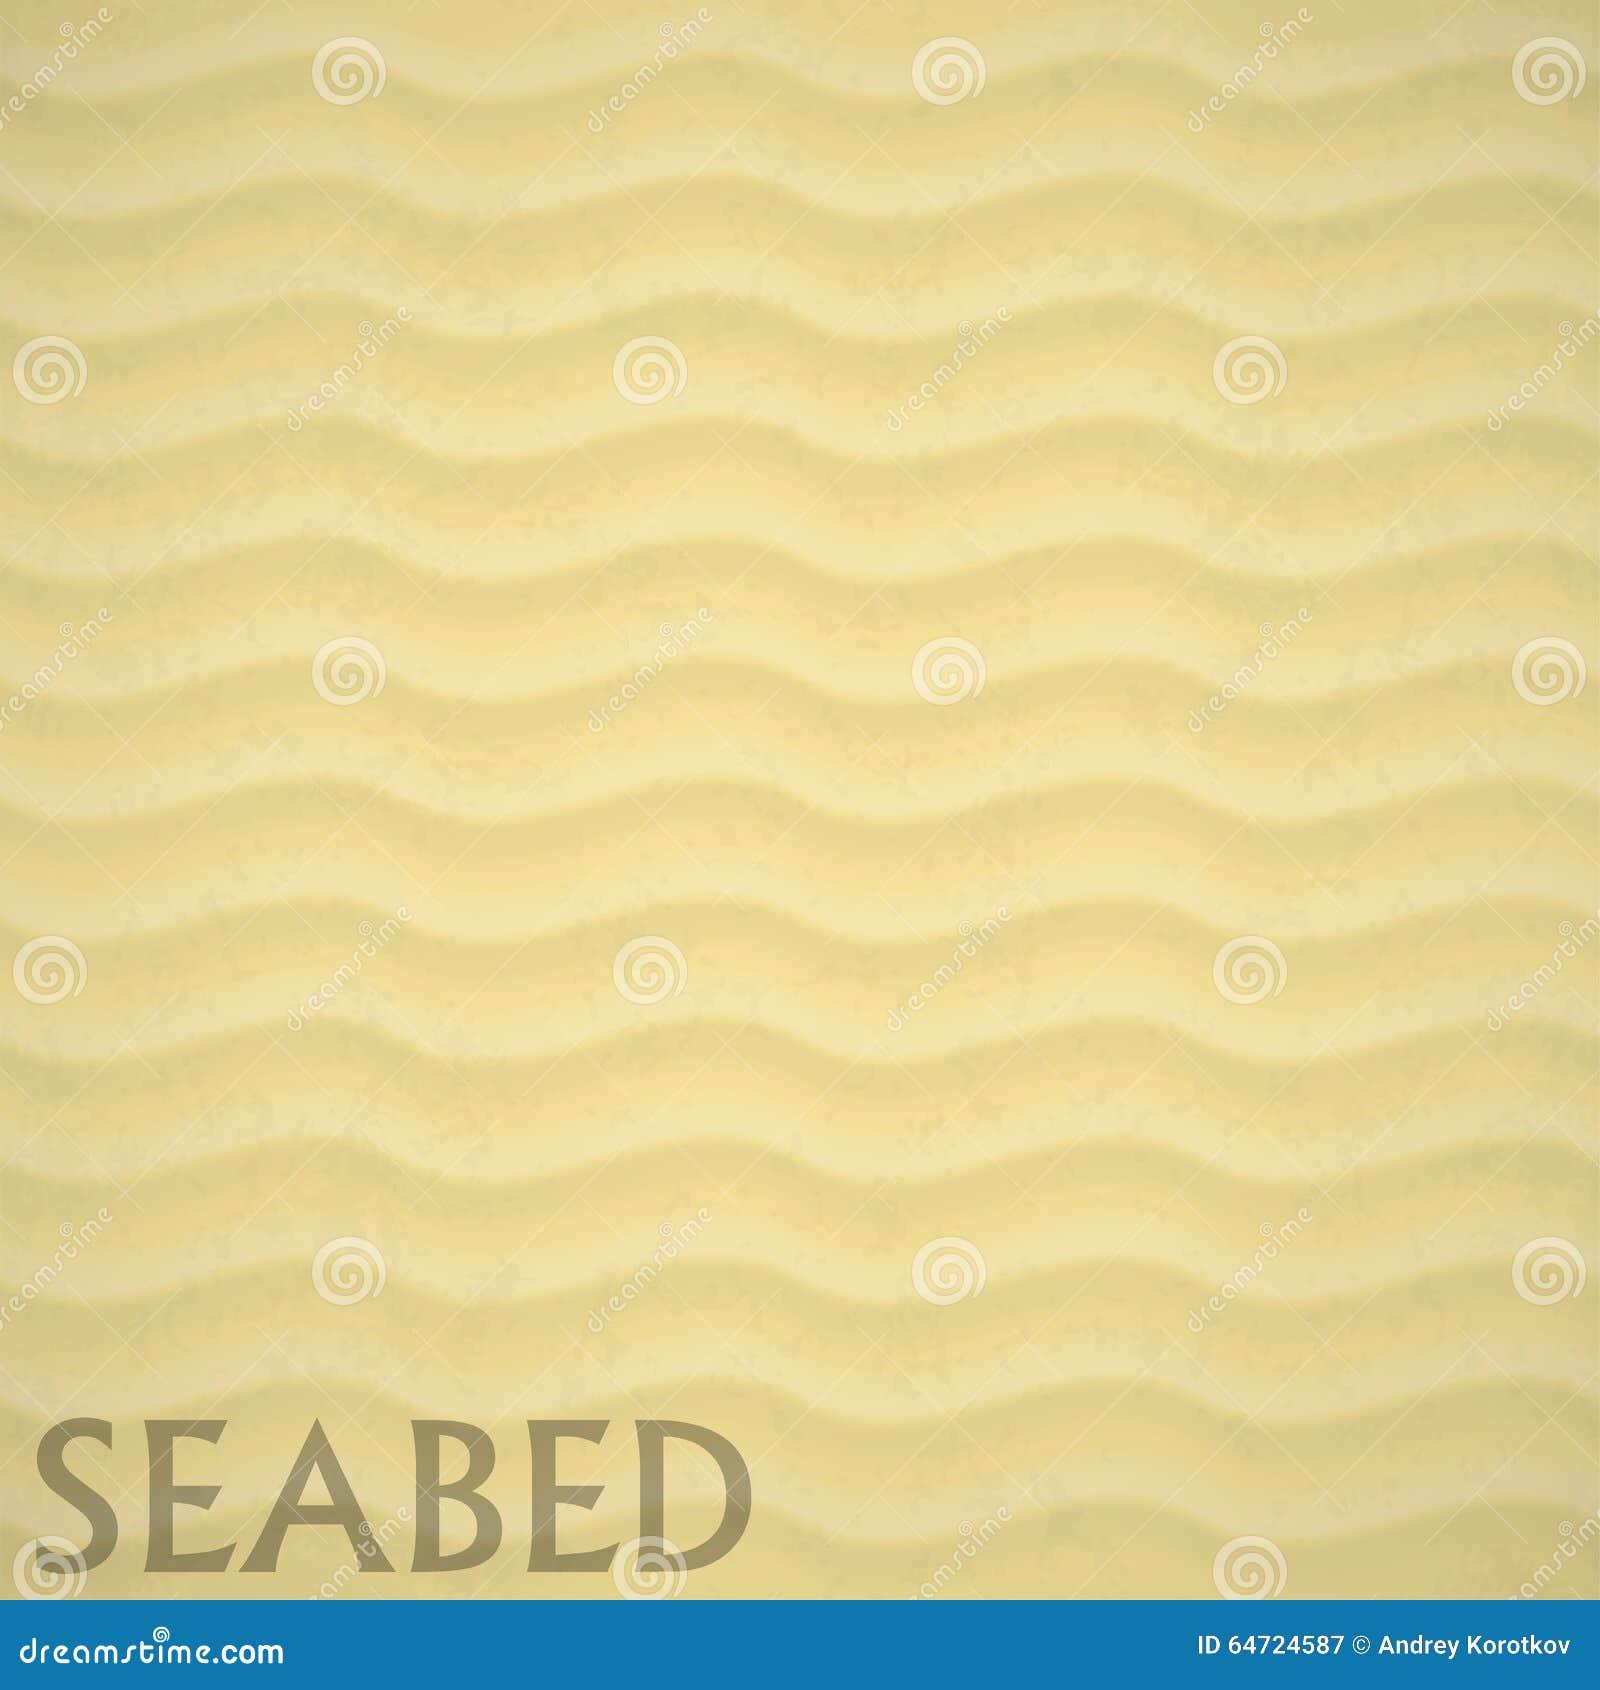 sea bed beach vector -#main